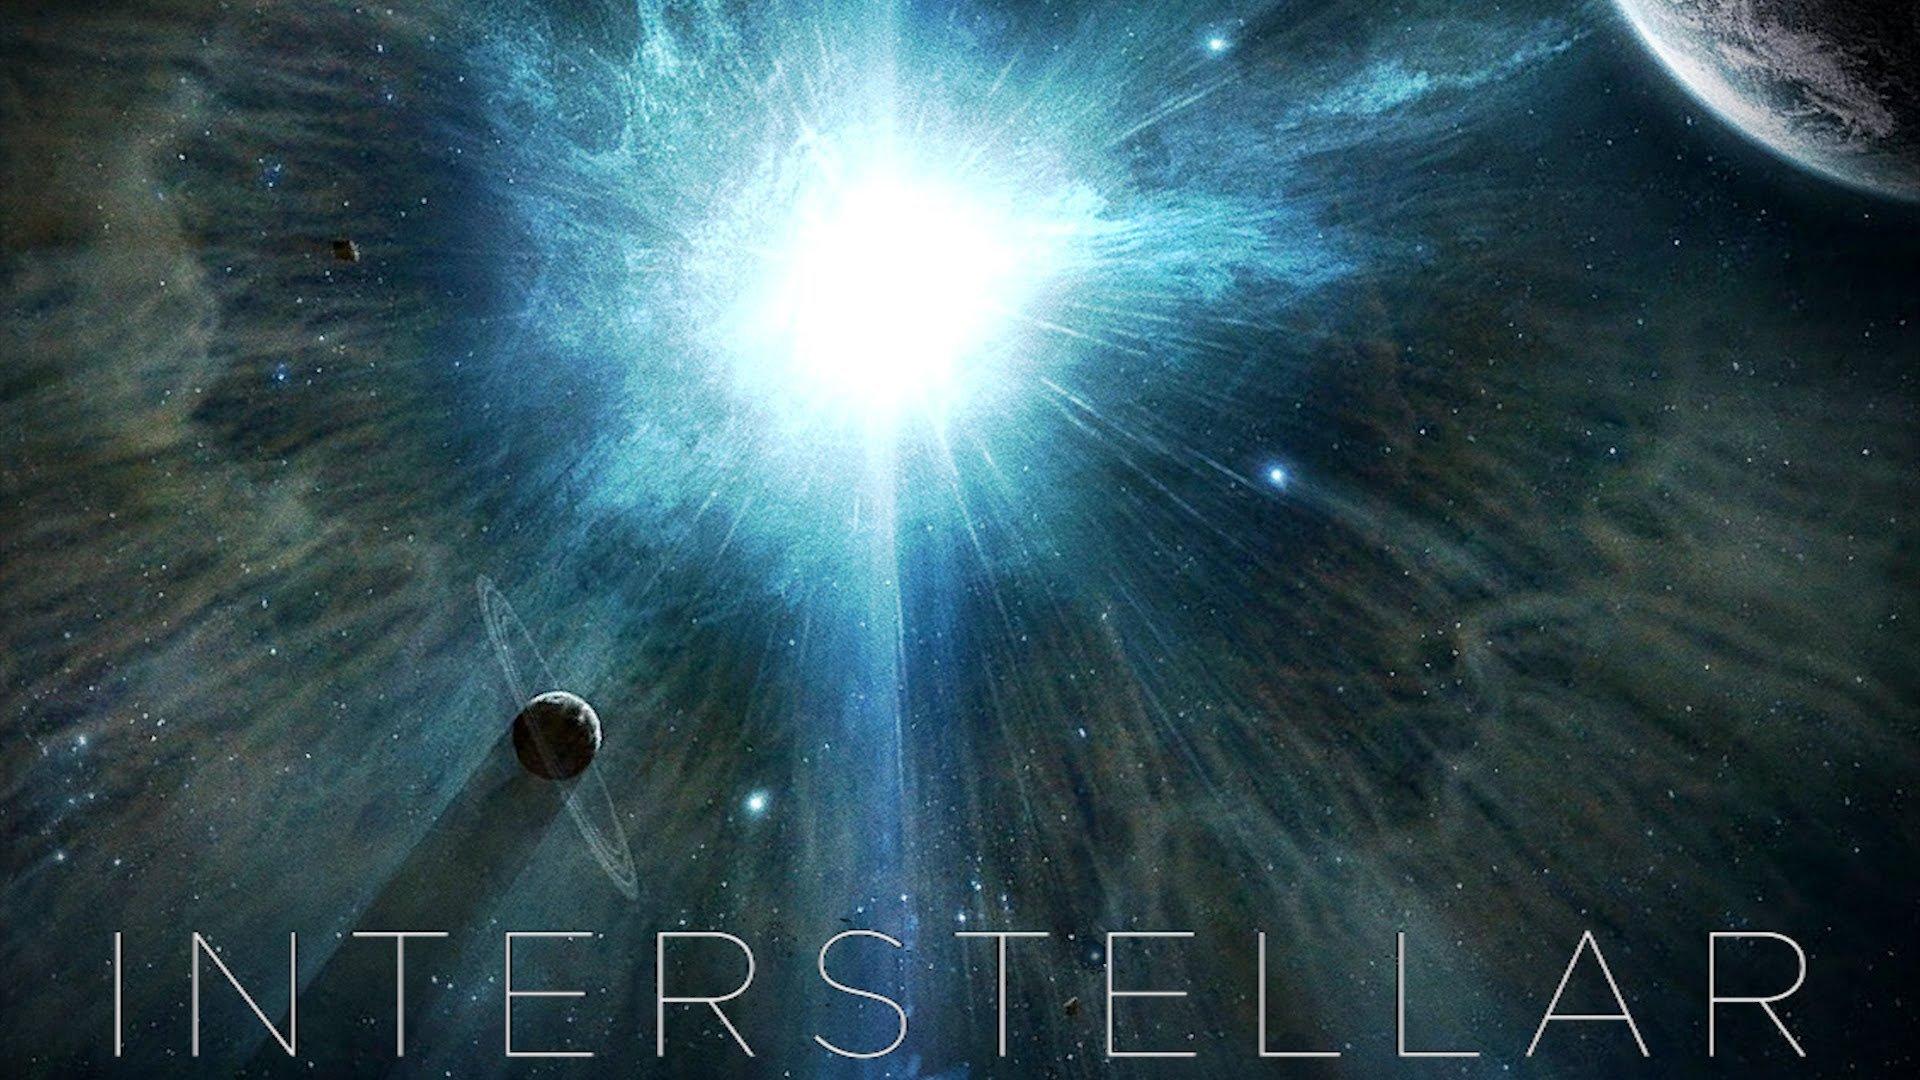 mystery sci fi futuristic film space planet stars wallpaper background 1920x1080